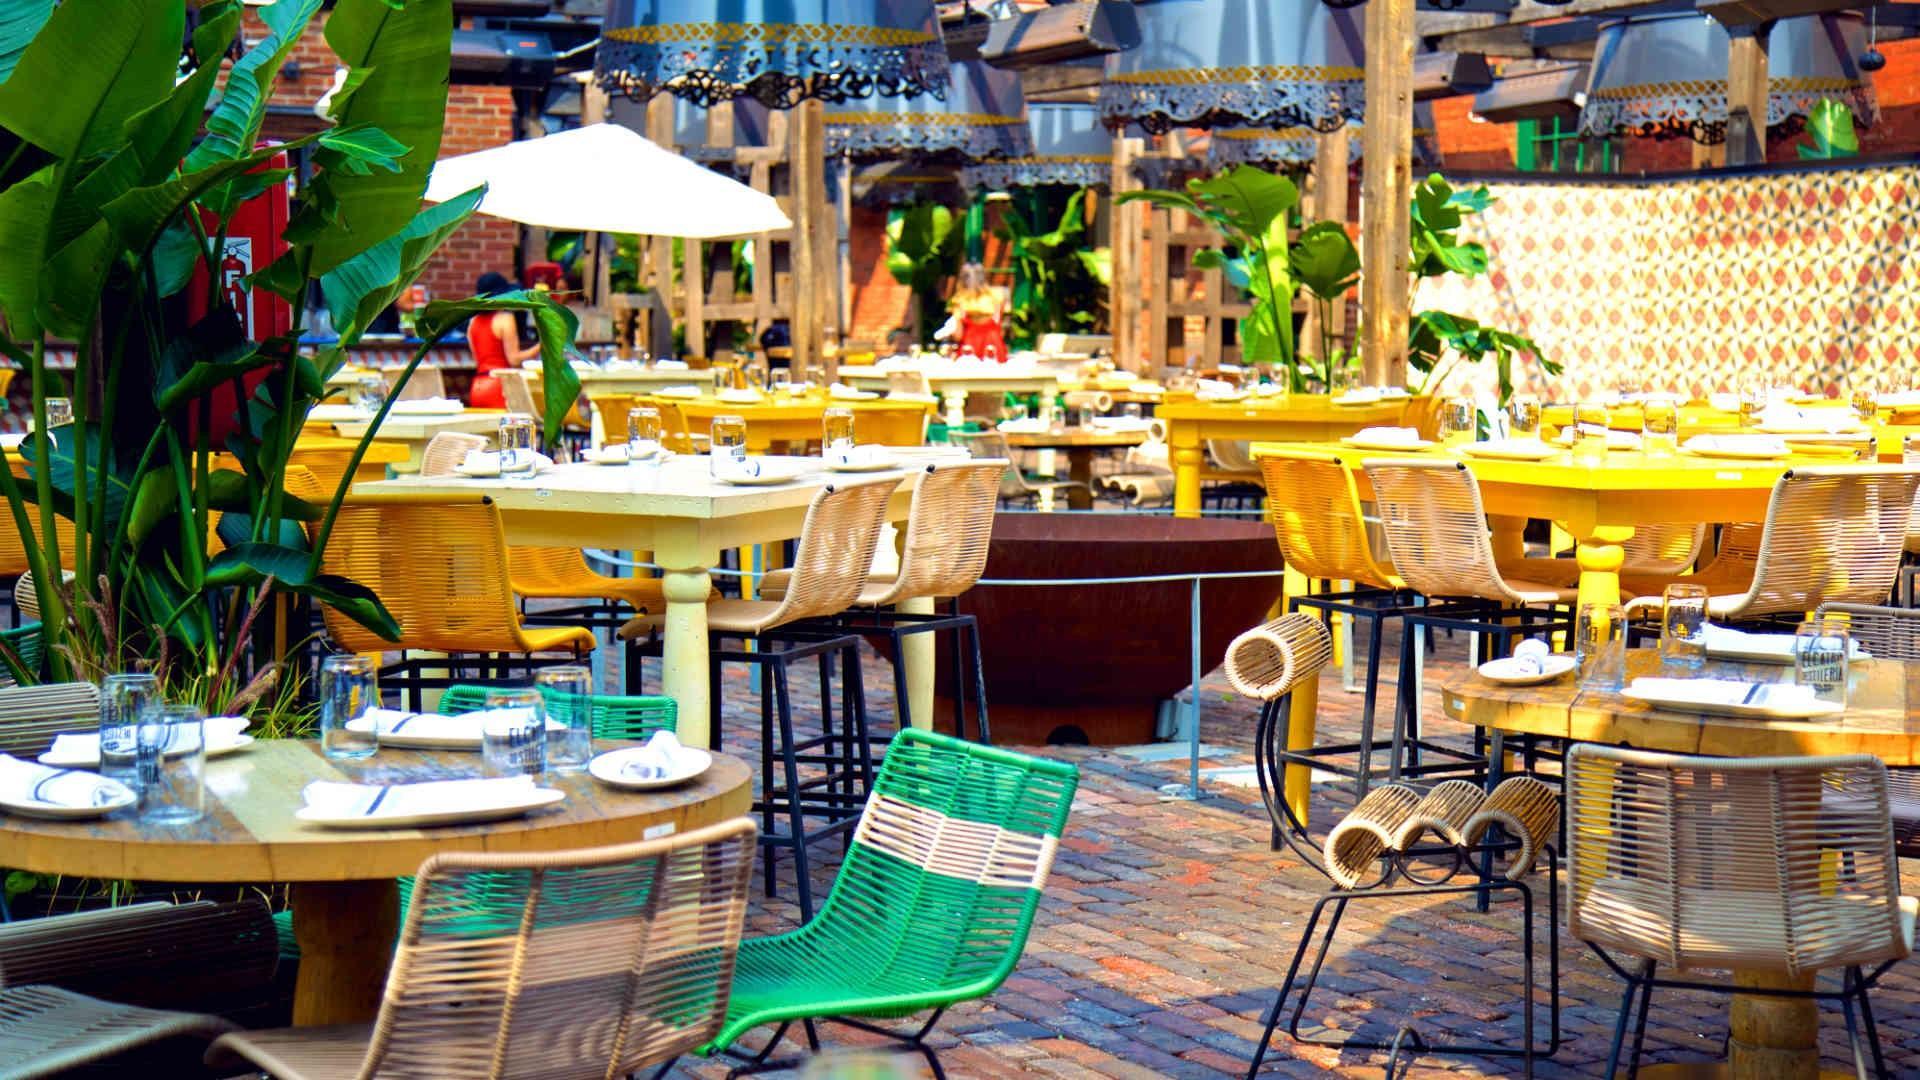 The best patios in Toronto: El Catrin